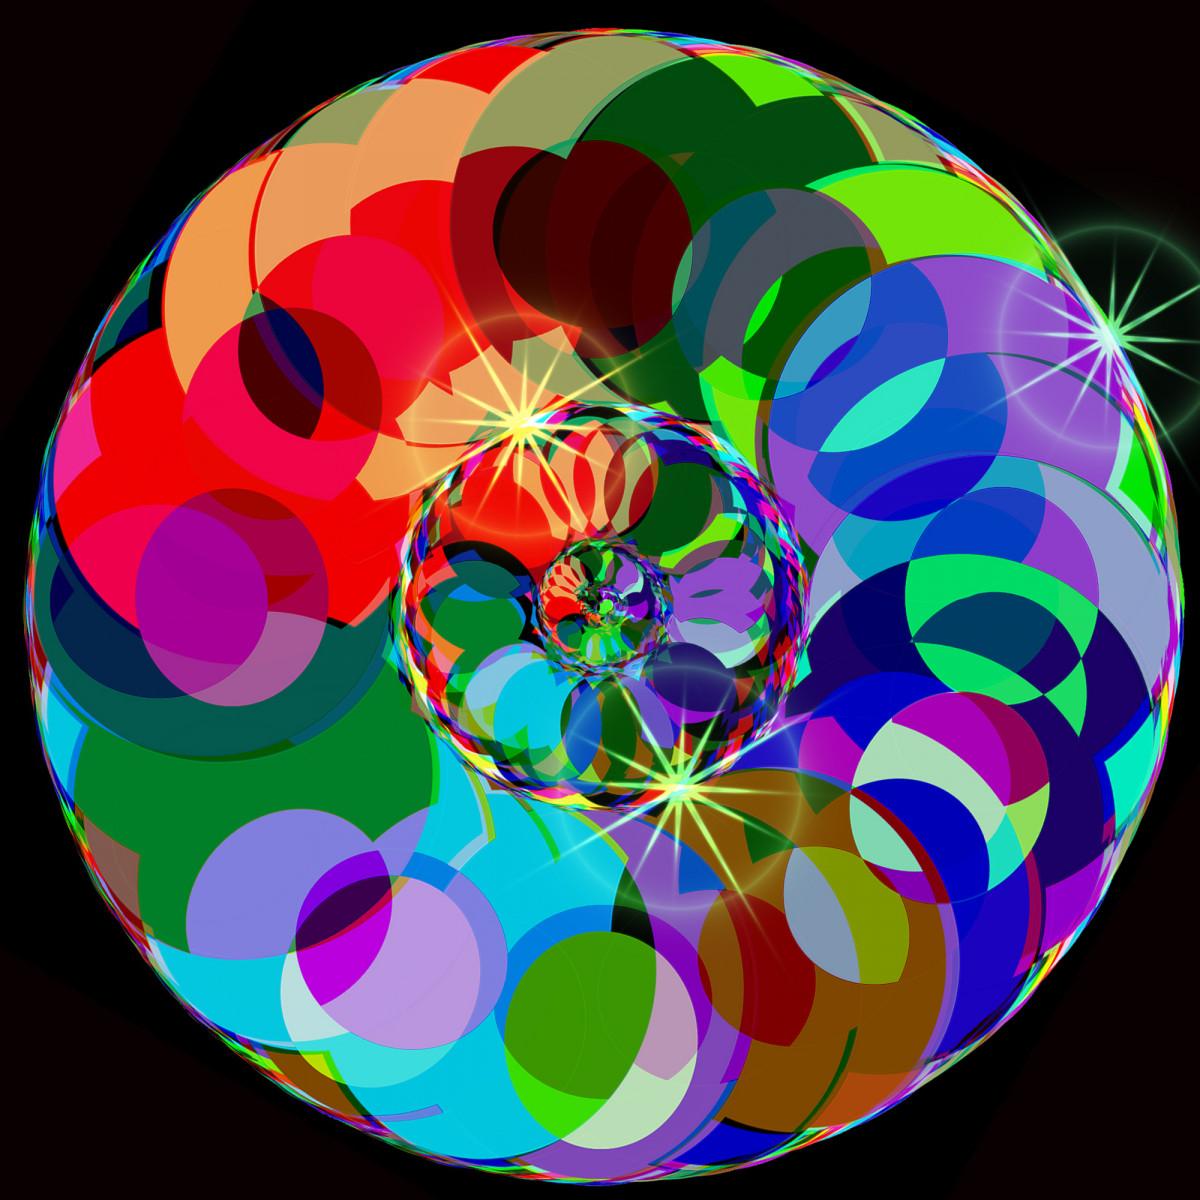 Color art digital - Pattern Color Artist Paint Toy Modern